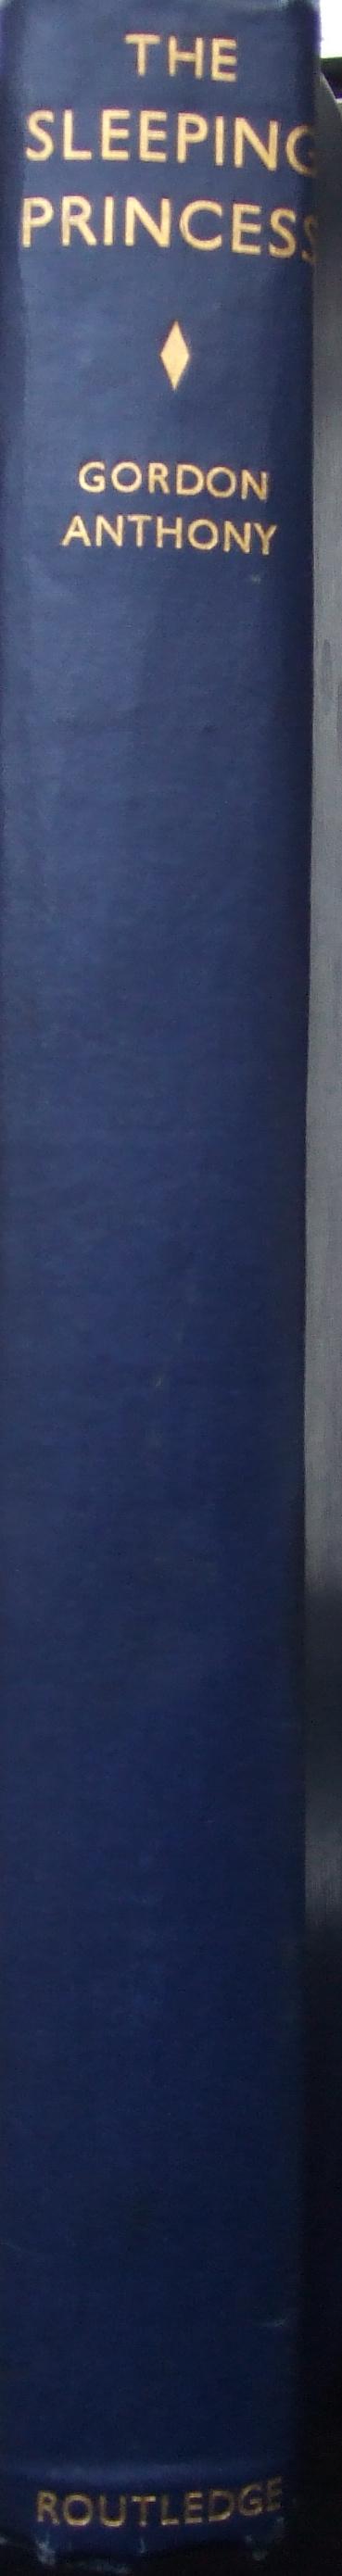 Binding.  The SLEEPING PRINCESS, 1940.